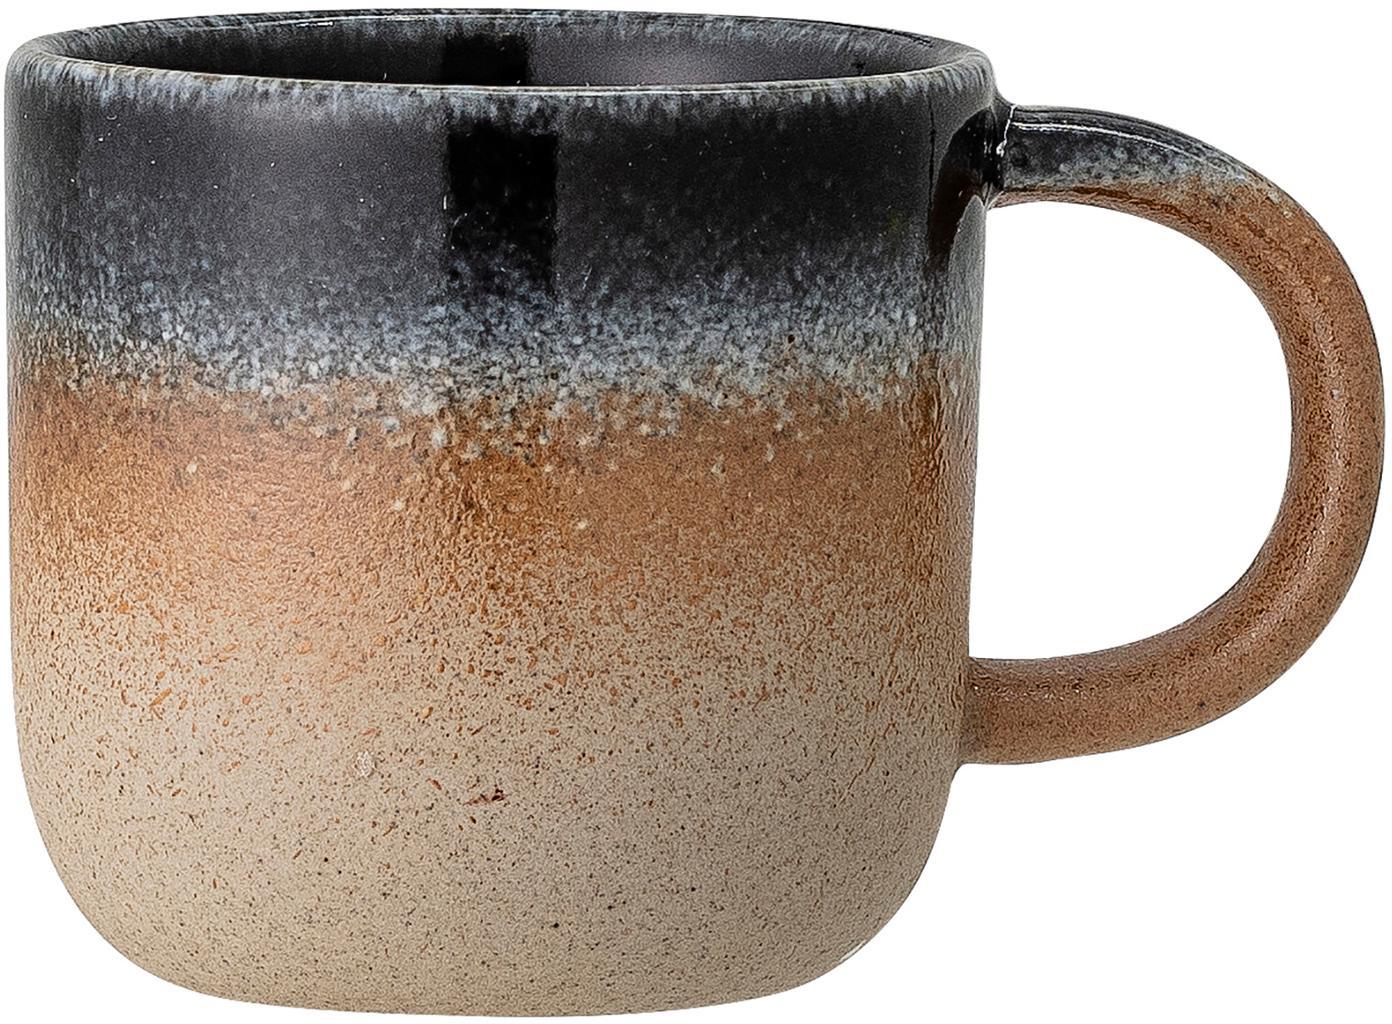 Taza artesanal Aura, Porcelana, Tonos beiges y azules, Ø 8 x Al 8 cm